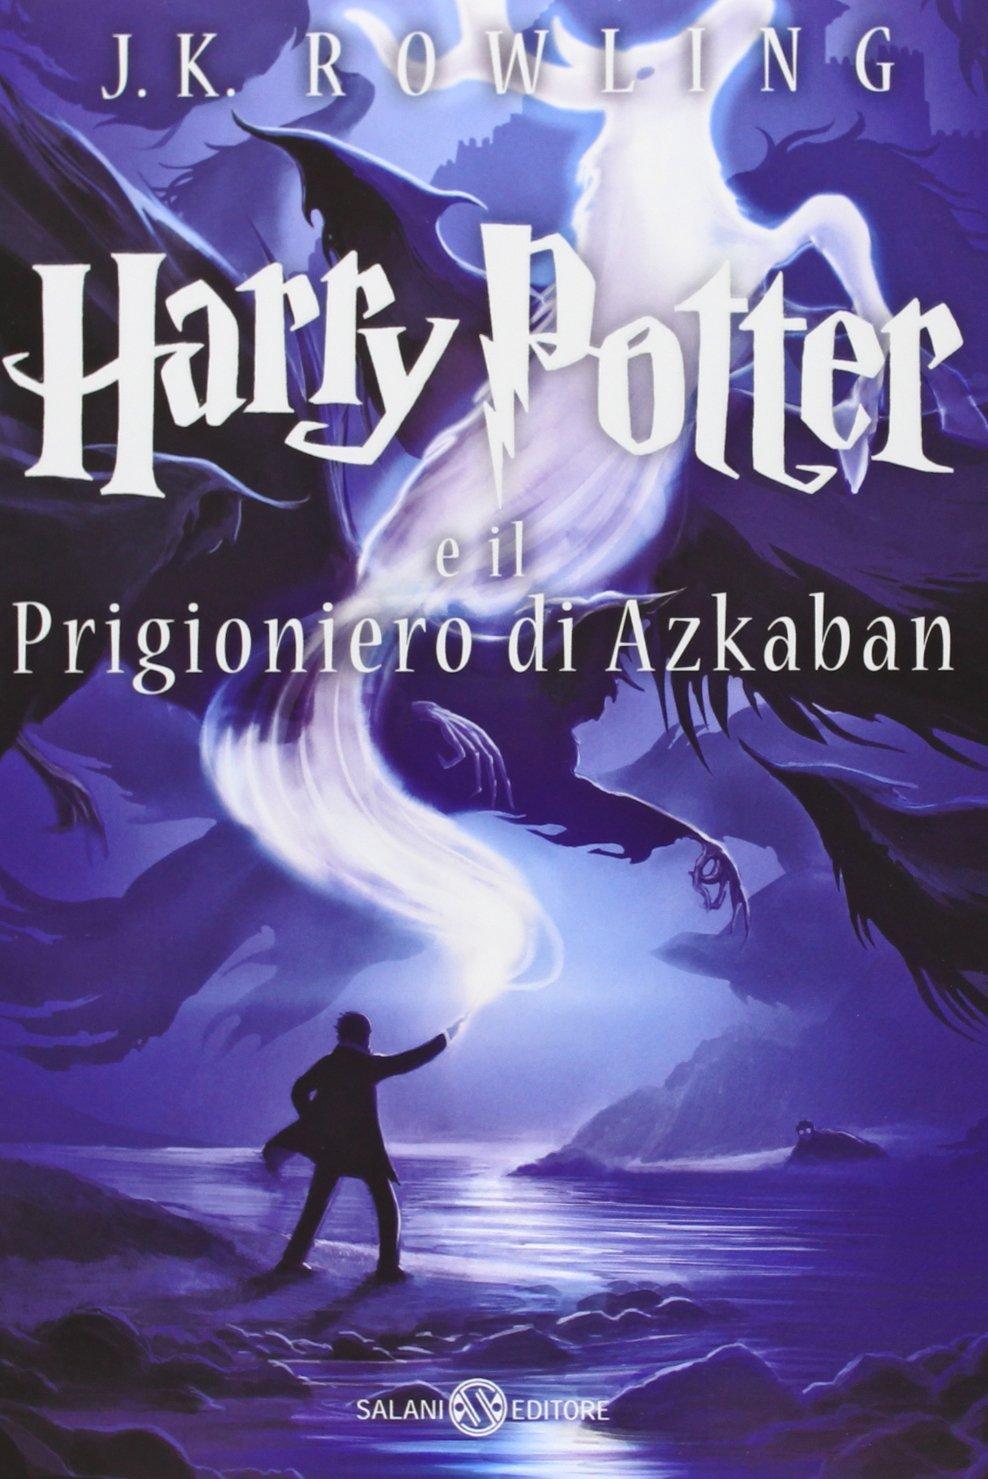 Harry Potter and the Prisoner of Azkaban Castle Ediotion 2013 – Italian Cover